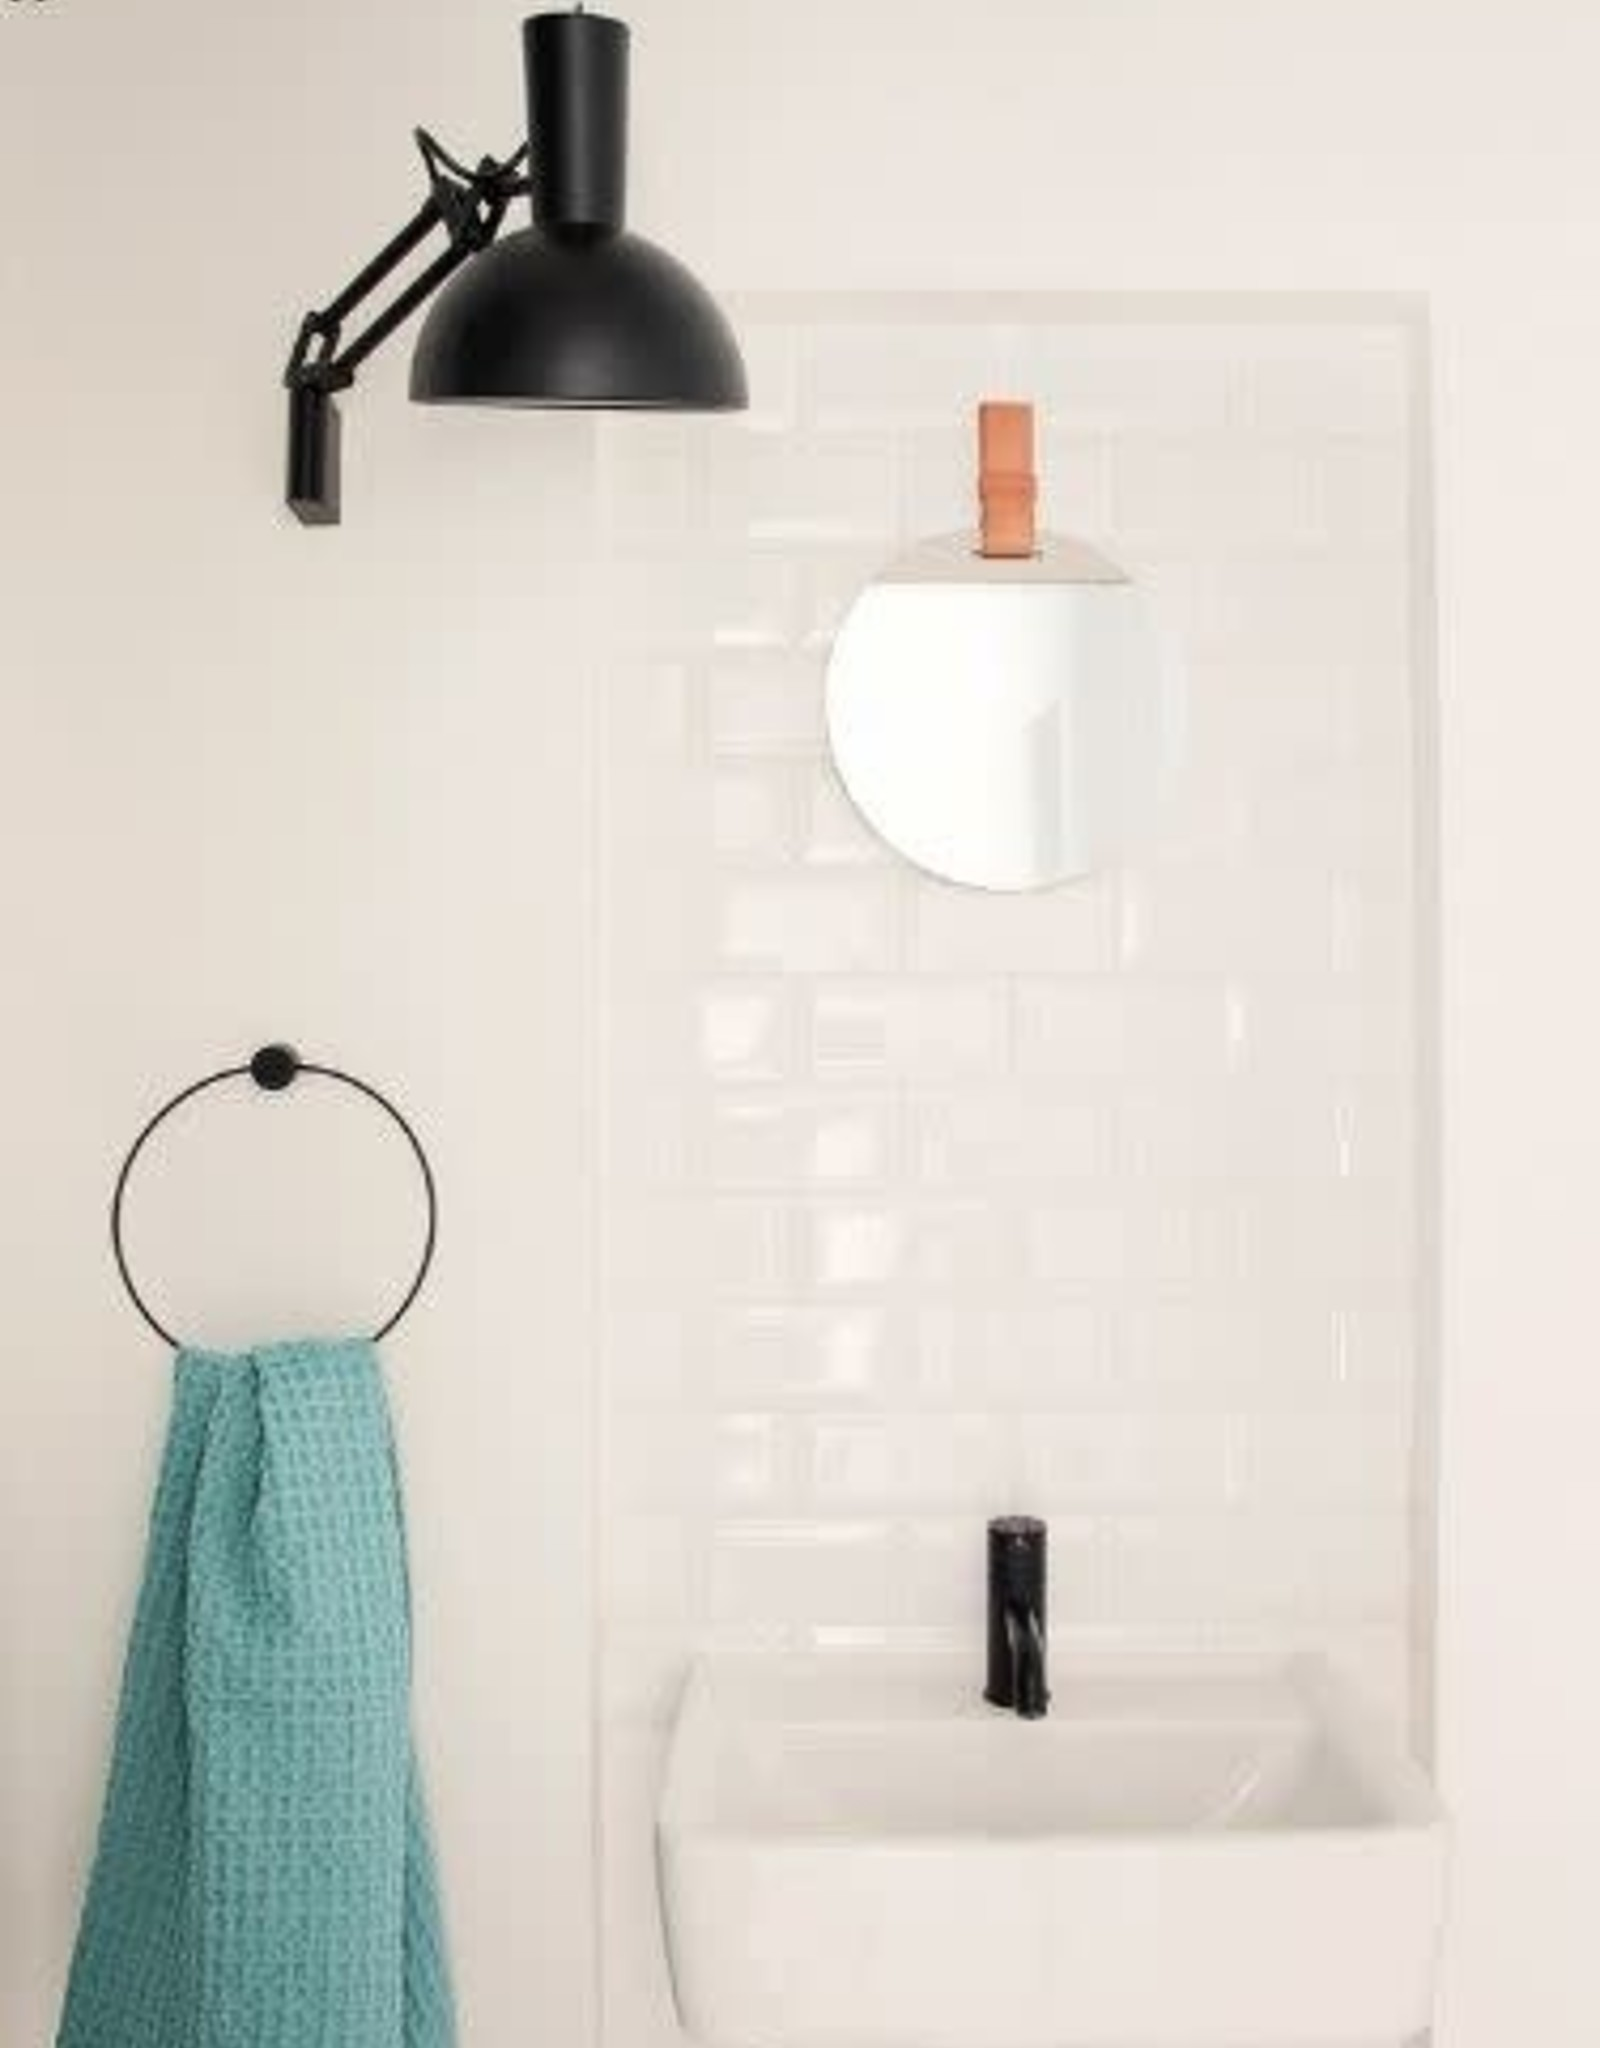 Ferm Living Towel Hanger - Black